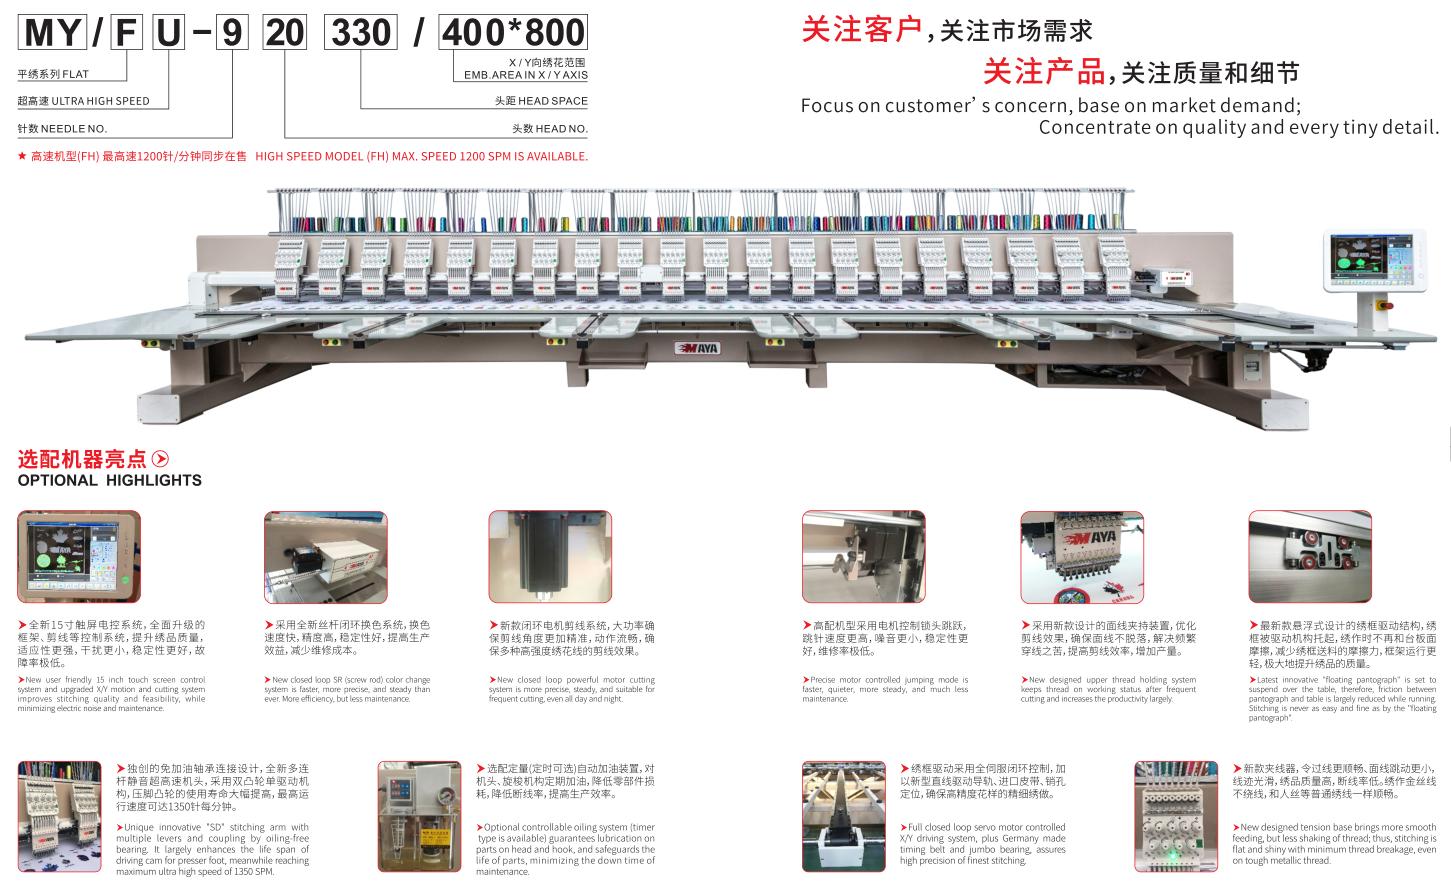 FU-920详情-中文产品说明PDF65截图x1.5倍像素放大.png